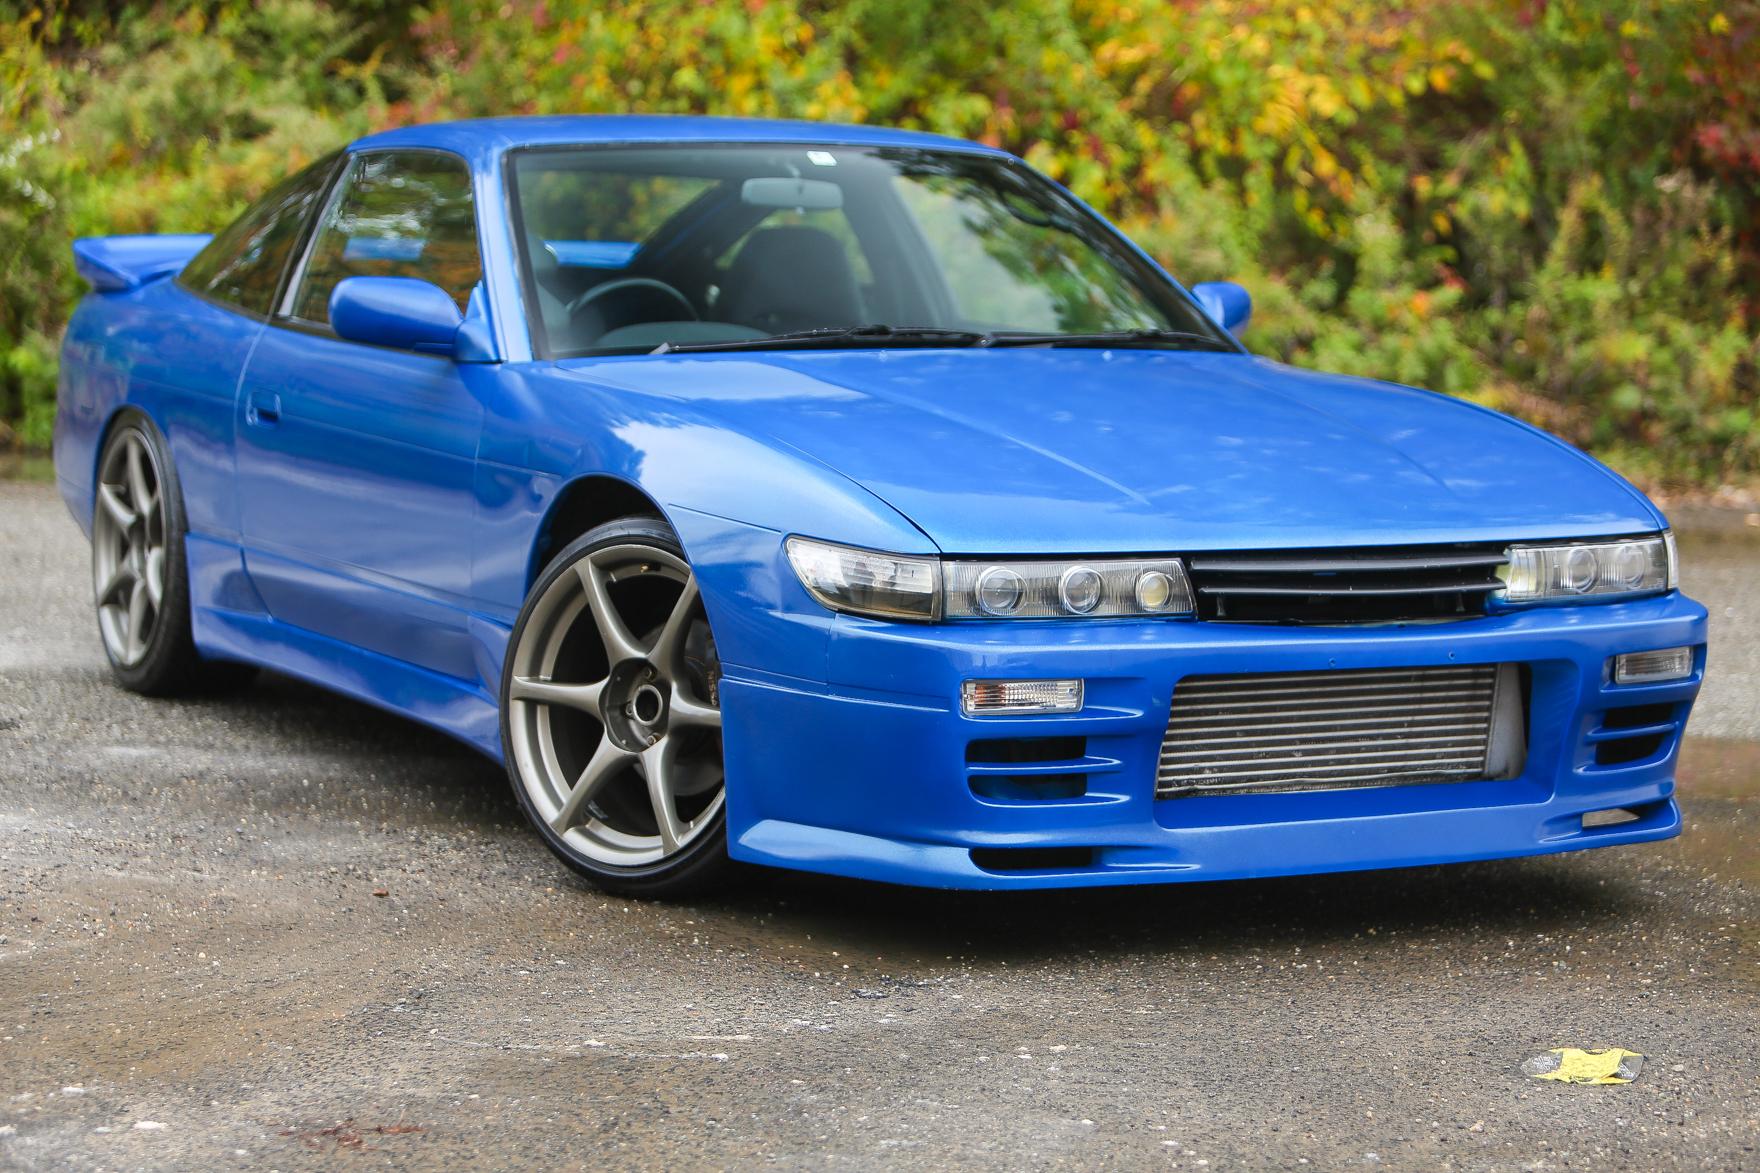 1995 Nissan 180sx Sil-eighty Turbo - $18,500